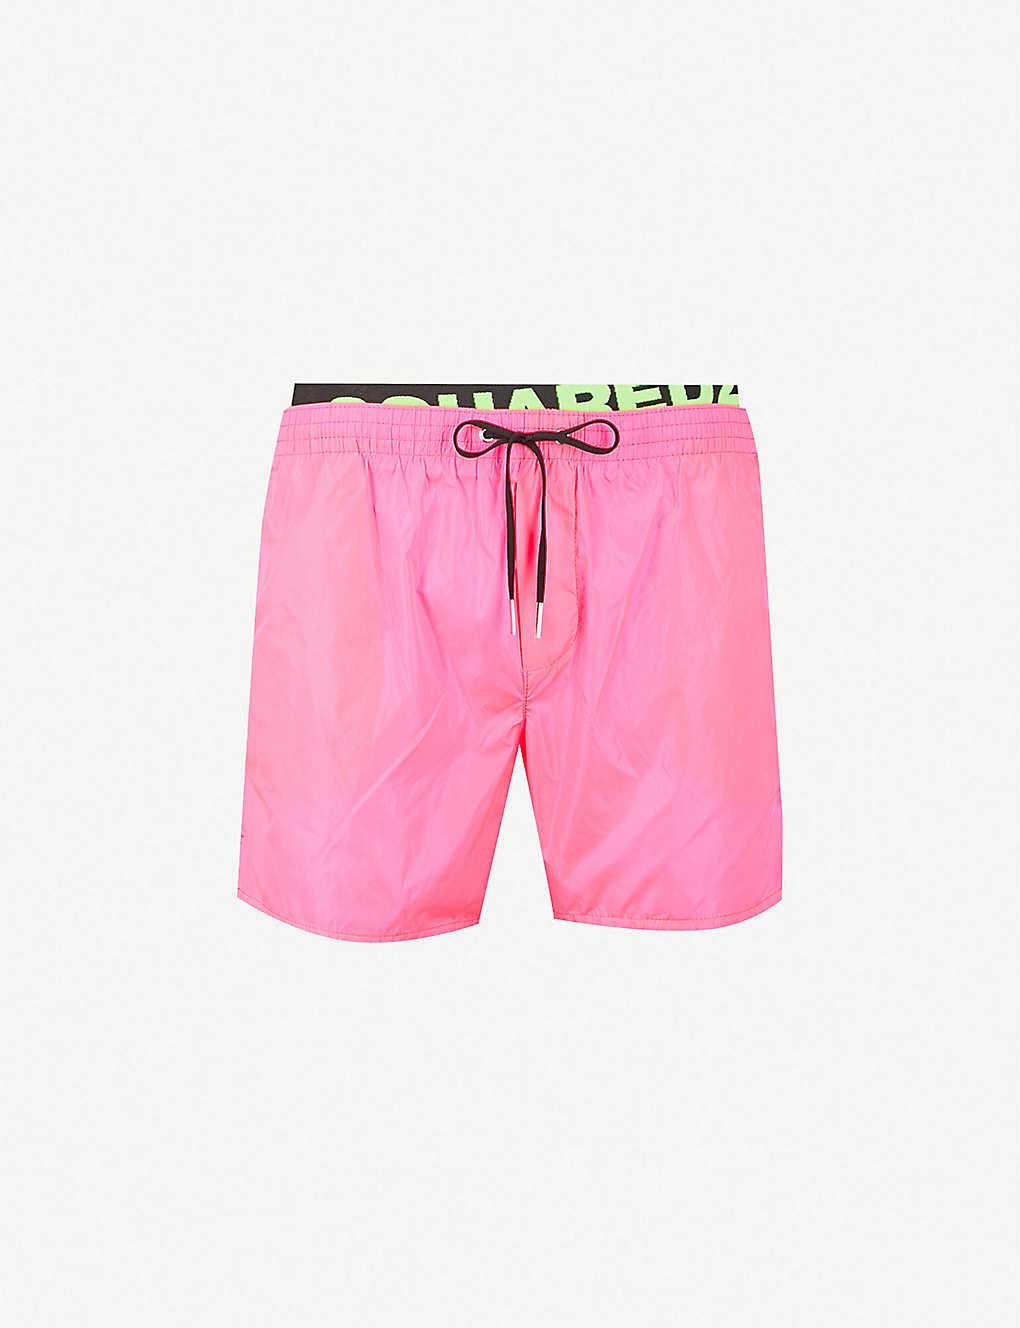 7b669cb7a1 DSQUARED2 - Logo-waistband swim shorts | Selfridges.com